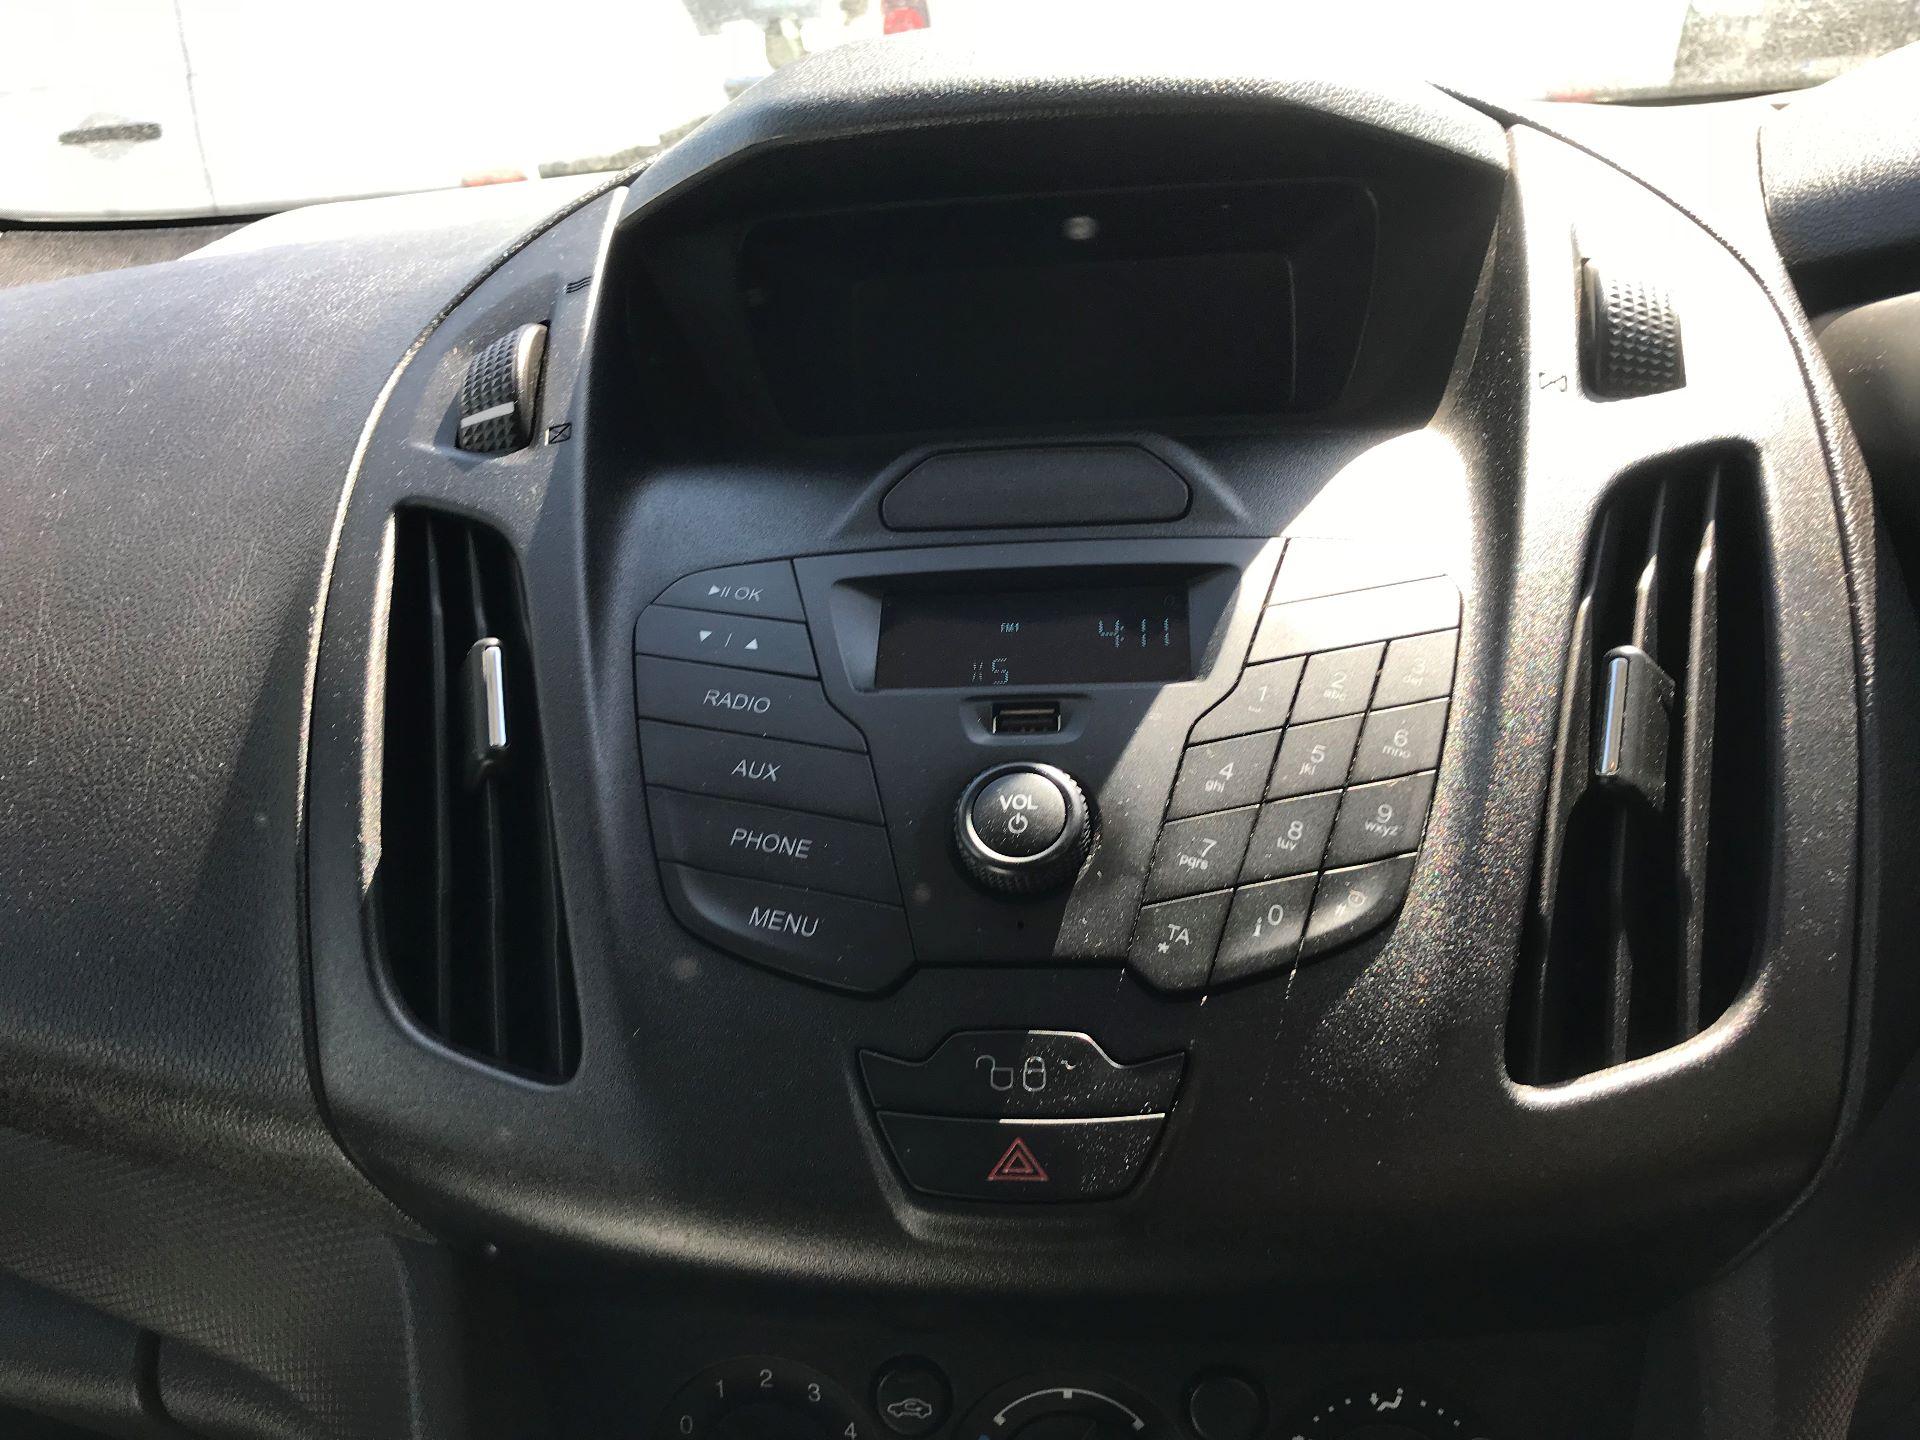 2016 Ford Transit Connect  220 L1 Diesel 1.5 TDCi 75PS Van EURO 6 (FA16ULS) Image 3